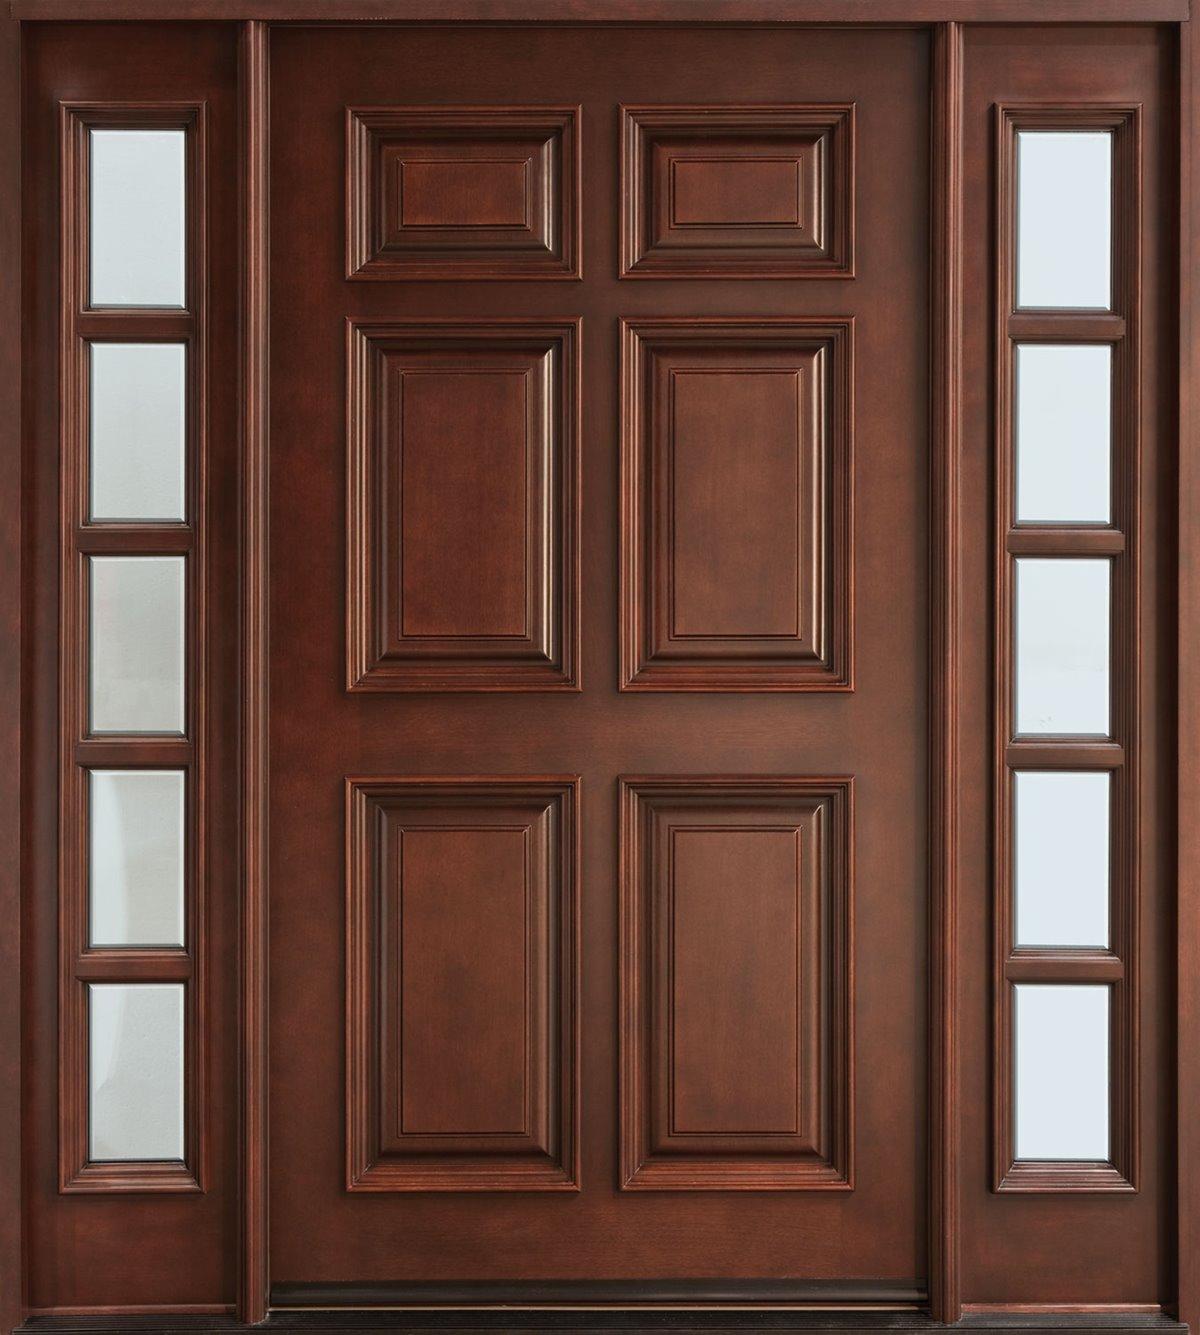 Desain Pintu Utama Minimalis Modern 2015 + 15 Gambar ...